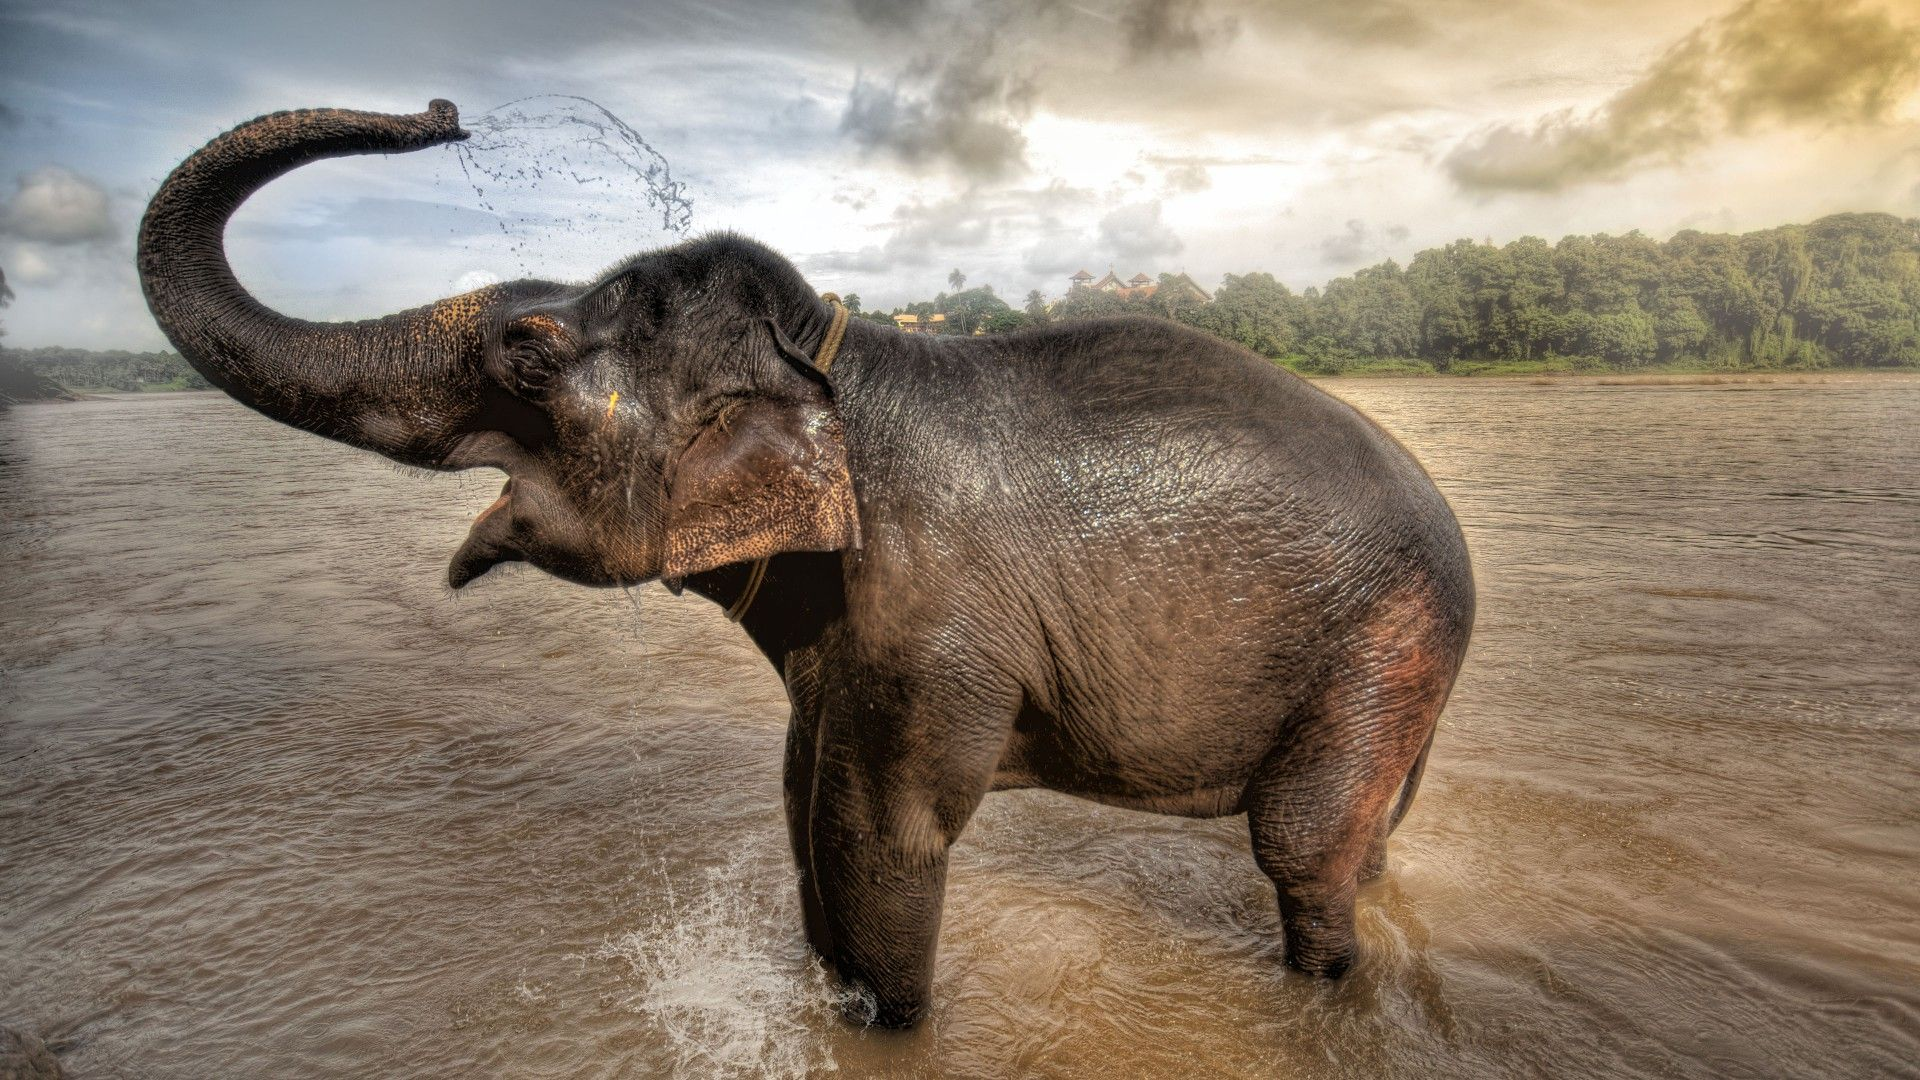 pin by katie whetham on elephants!! elephant, elephant factselephant wallpaper hd 1080pelephant wallpaper hd 1080p, 1920 x 1080, 616 kb,